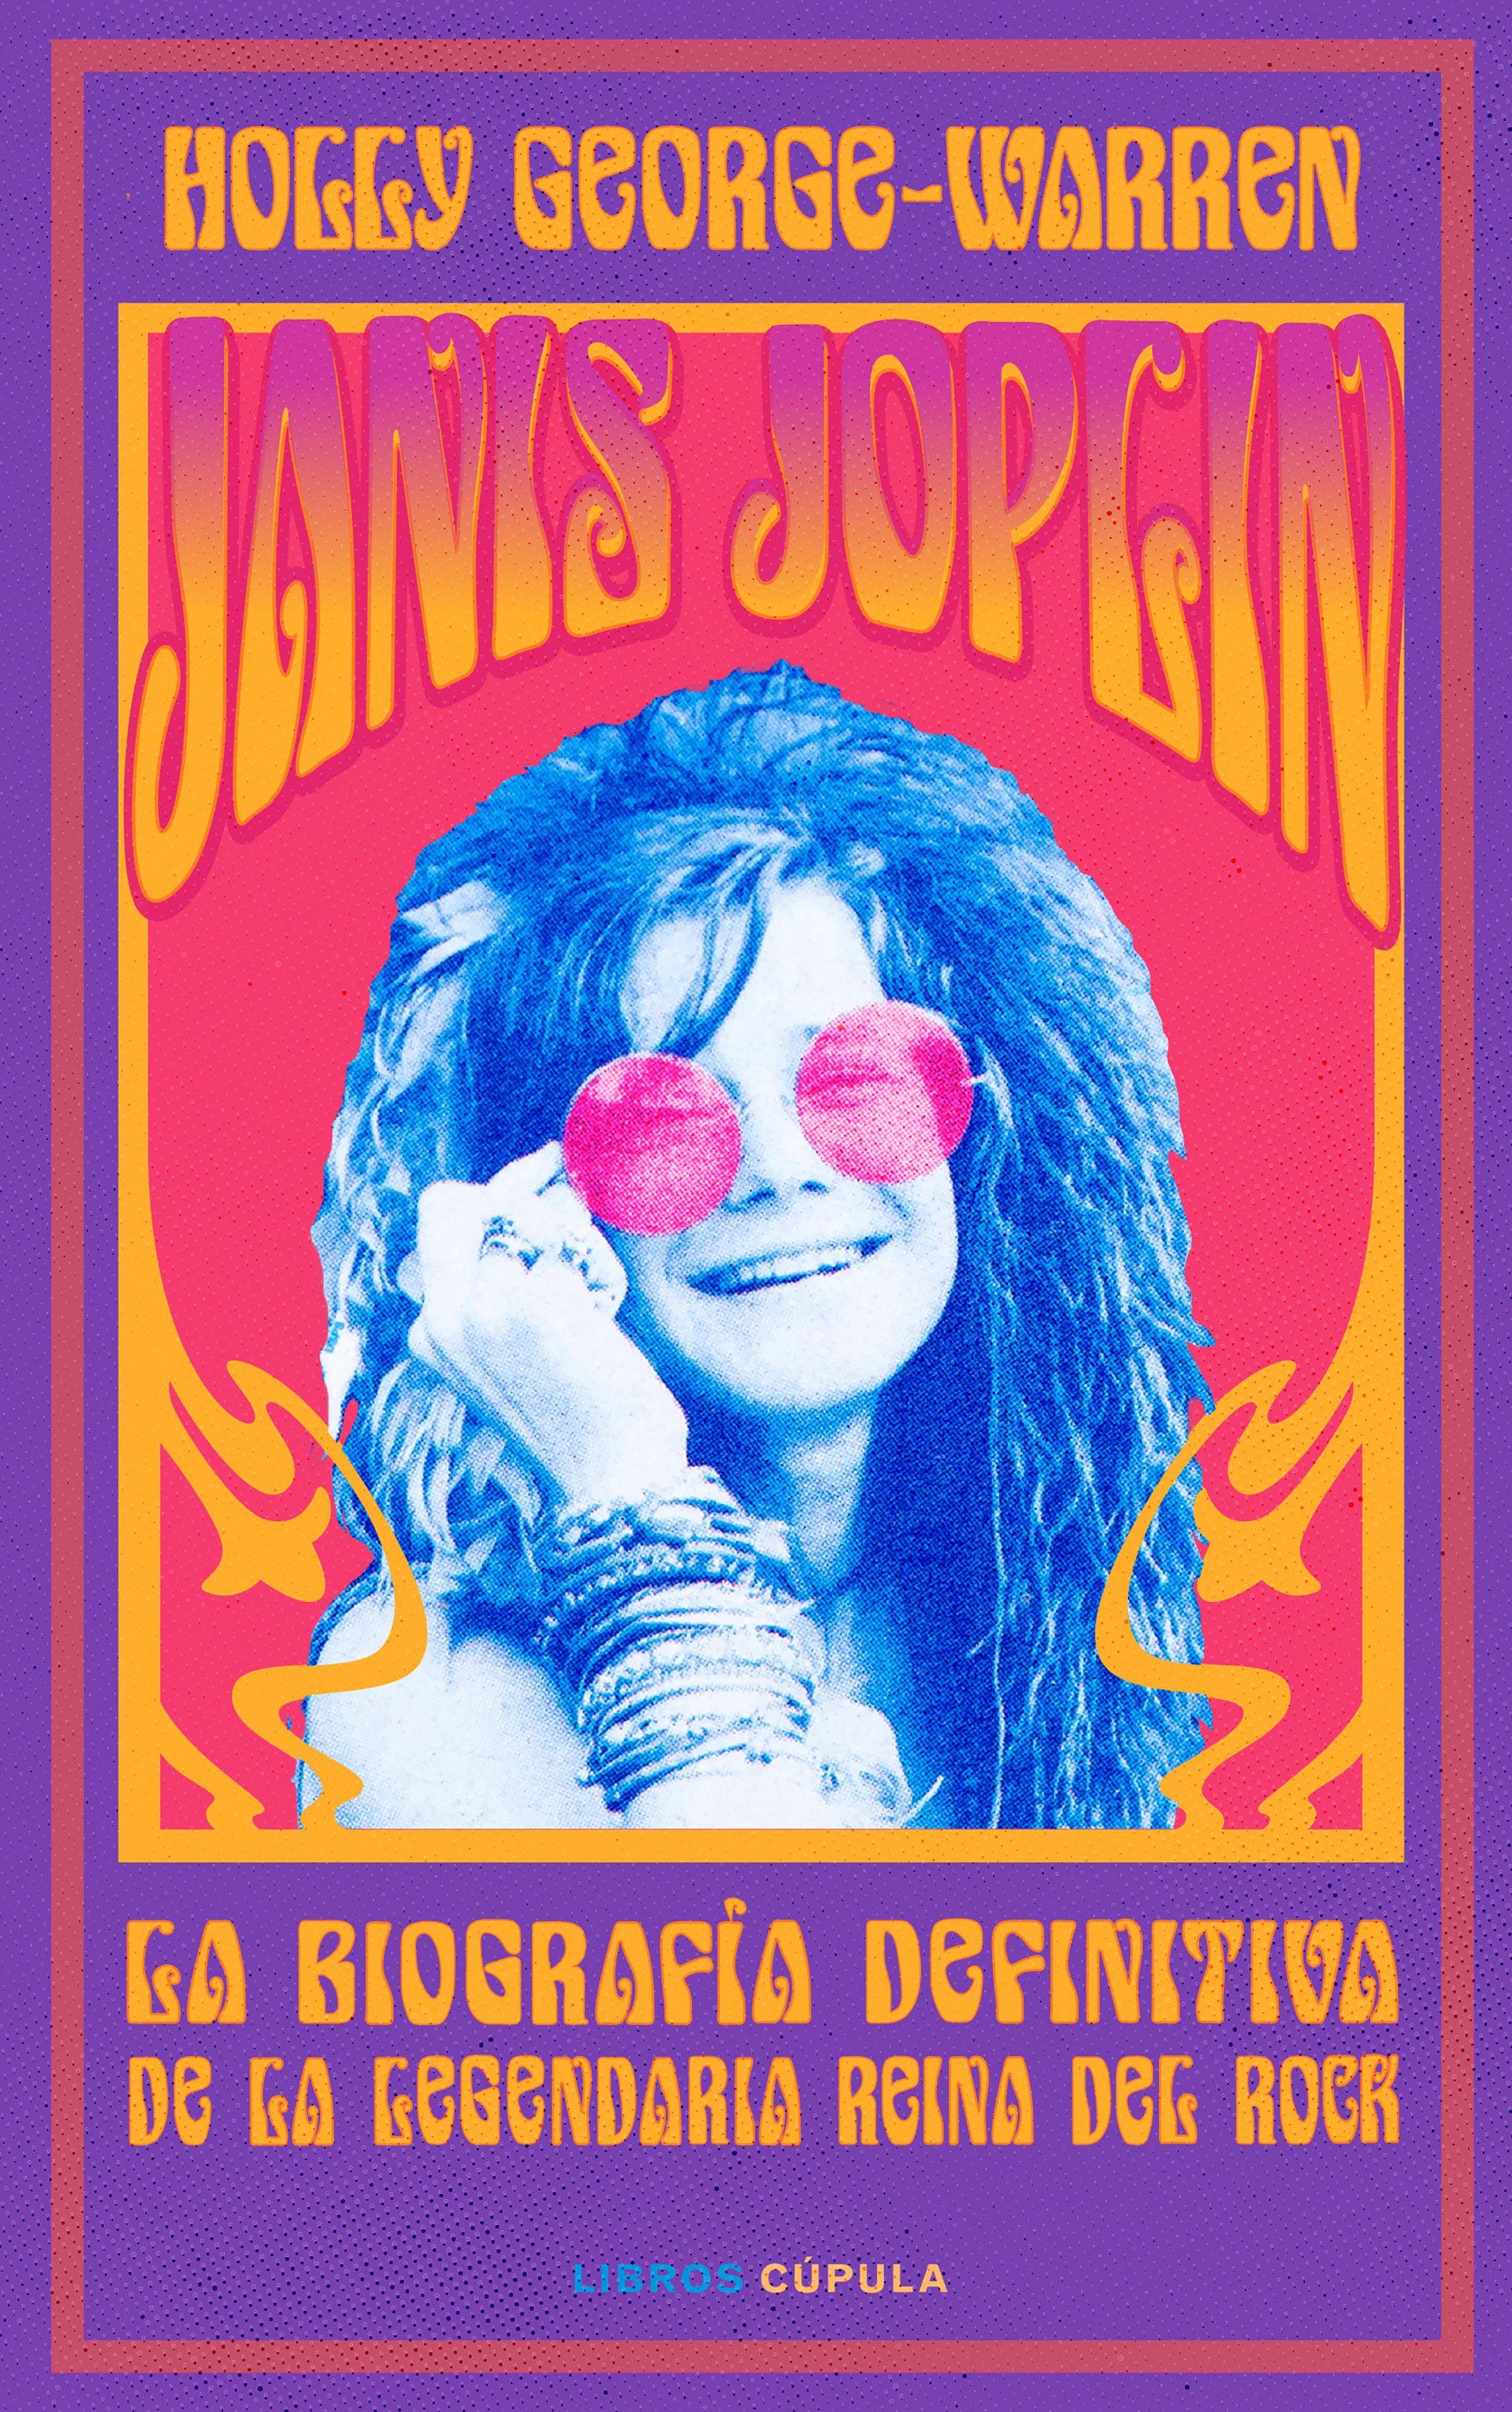 Literatura rock - Página 33 Portada_janis-joplin_holly-george-warren_202005151037